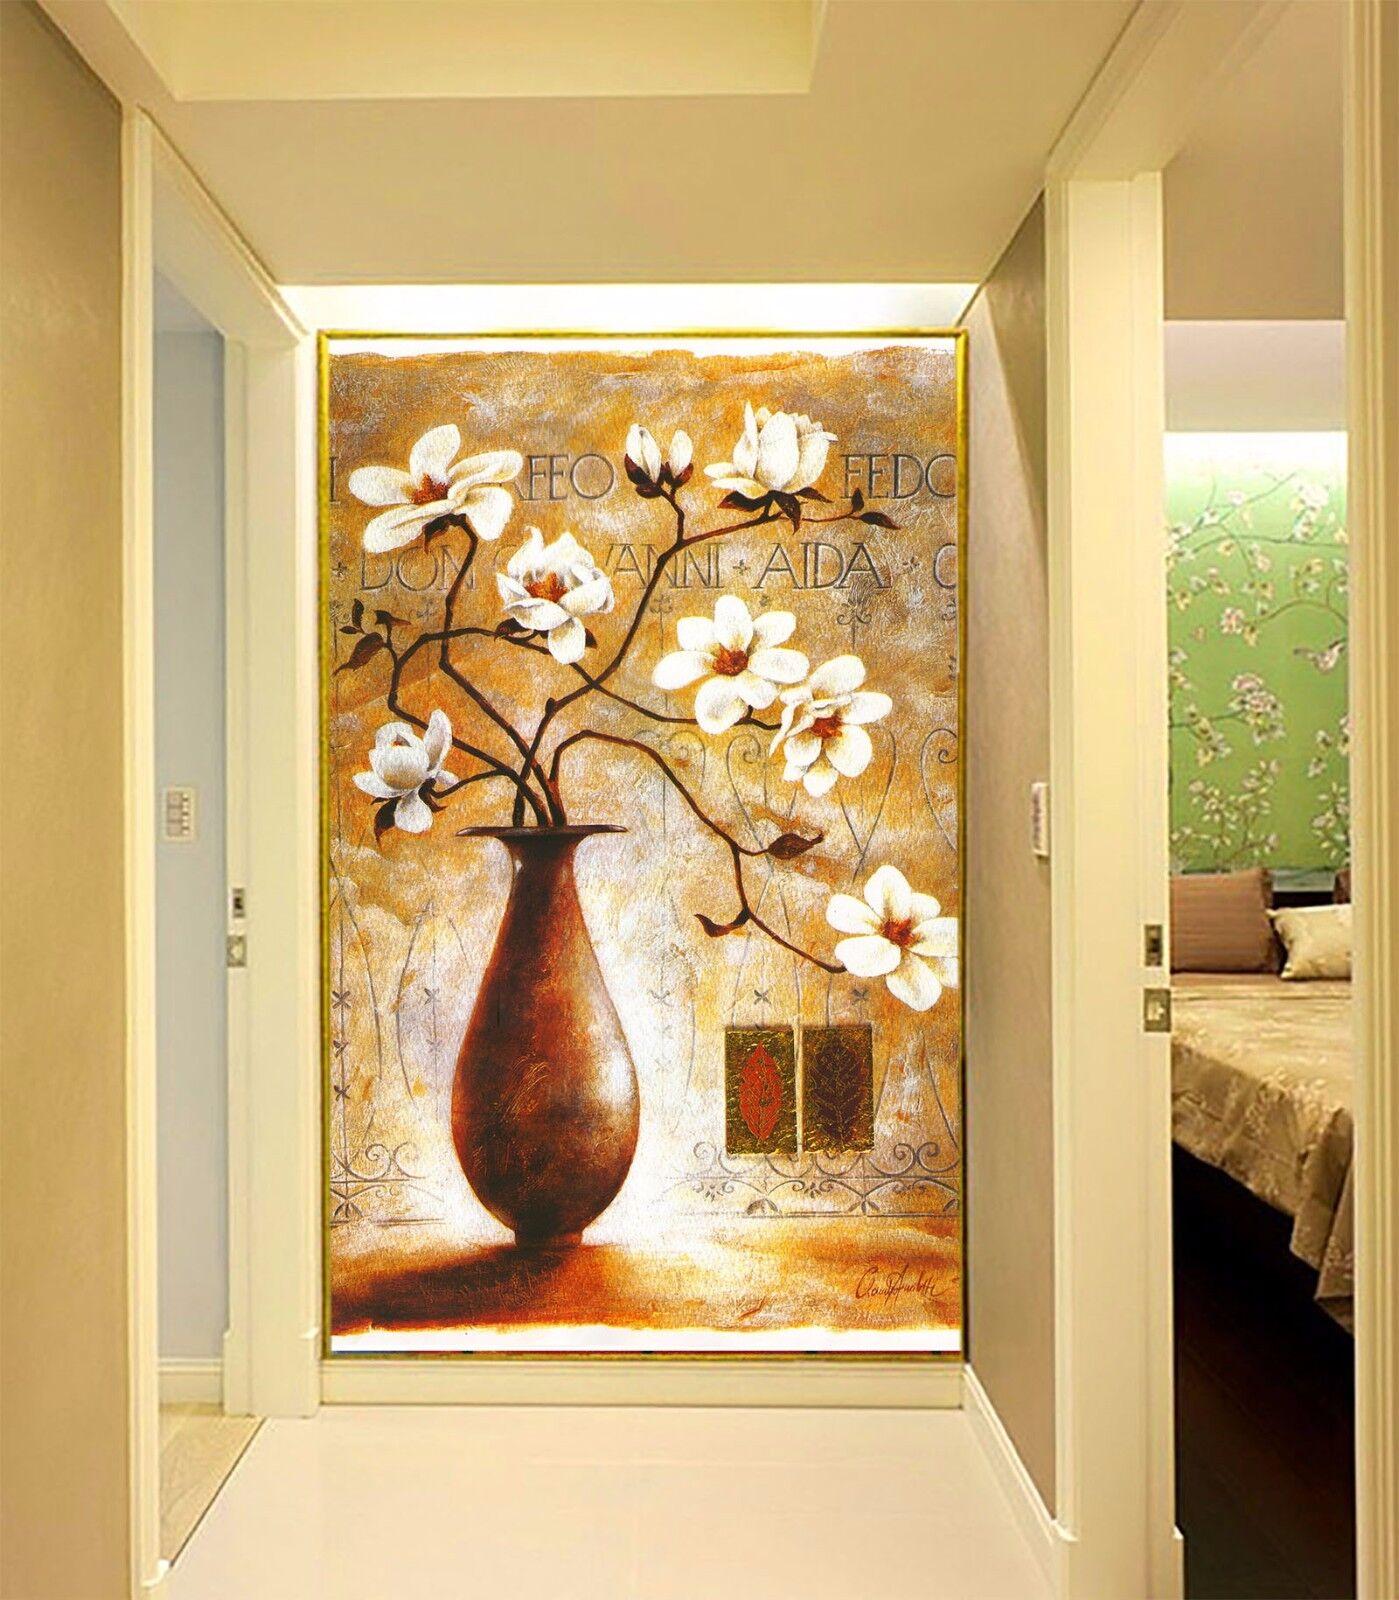 3D Vase Petal 541 Wallpaper Murals Wall Print Wall Mural AJ WALL AU Summer